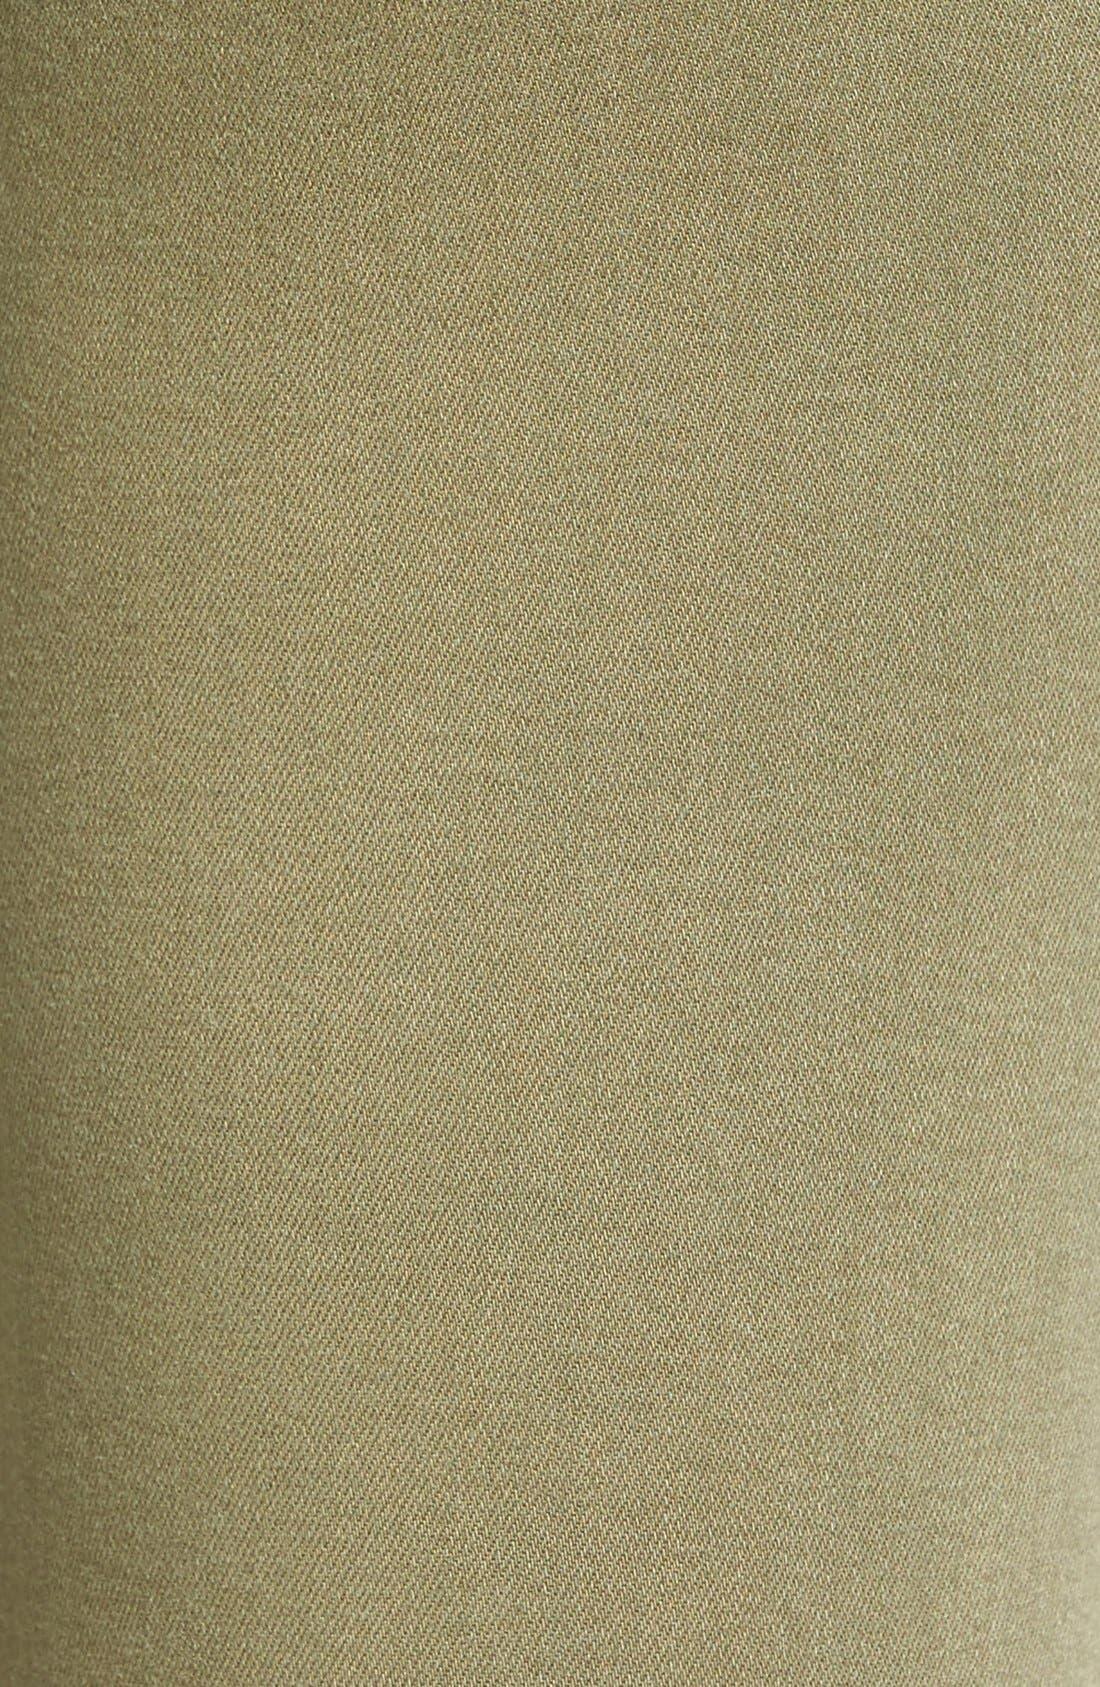 Transcend - Verdugo Ankle Skinny Jeans,                             Alternate thumbnail 6, color,                             300